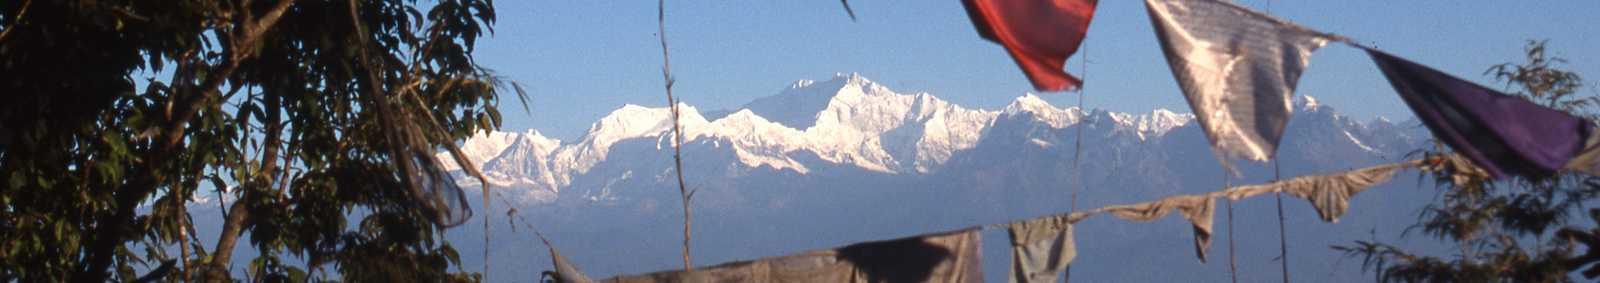 Kanchenjunga and prayer flags from Darjeeling, India